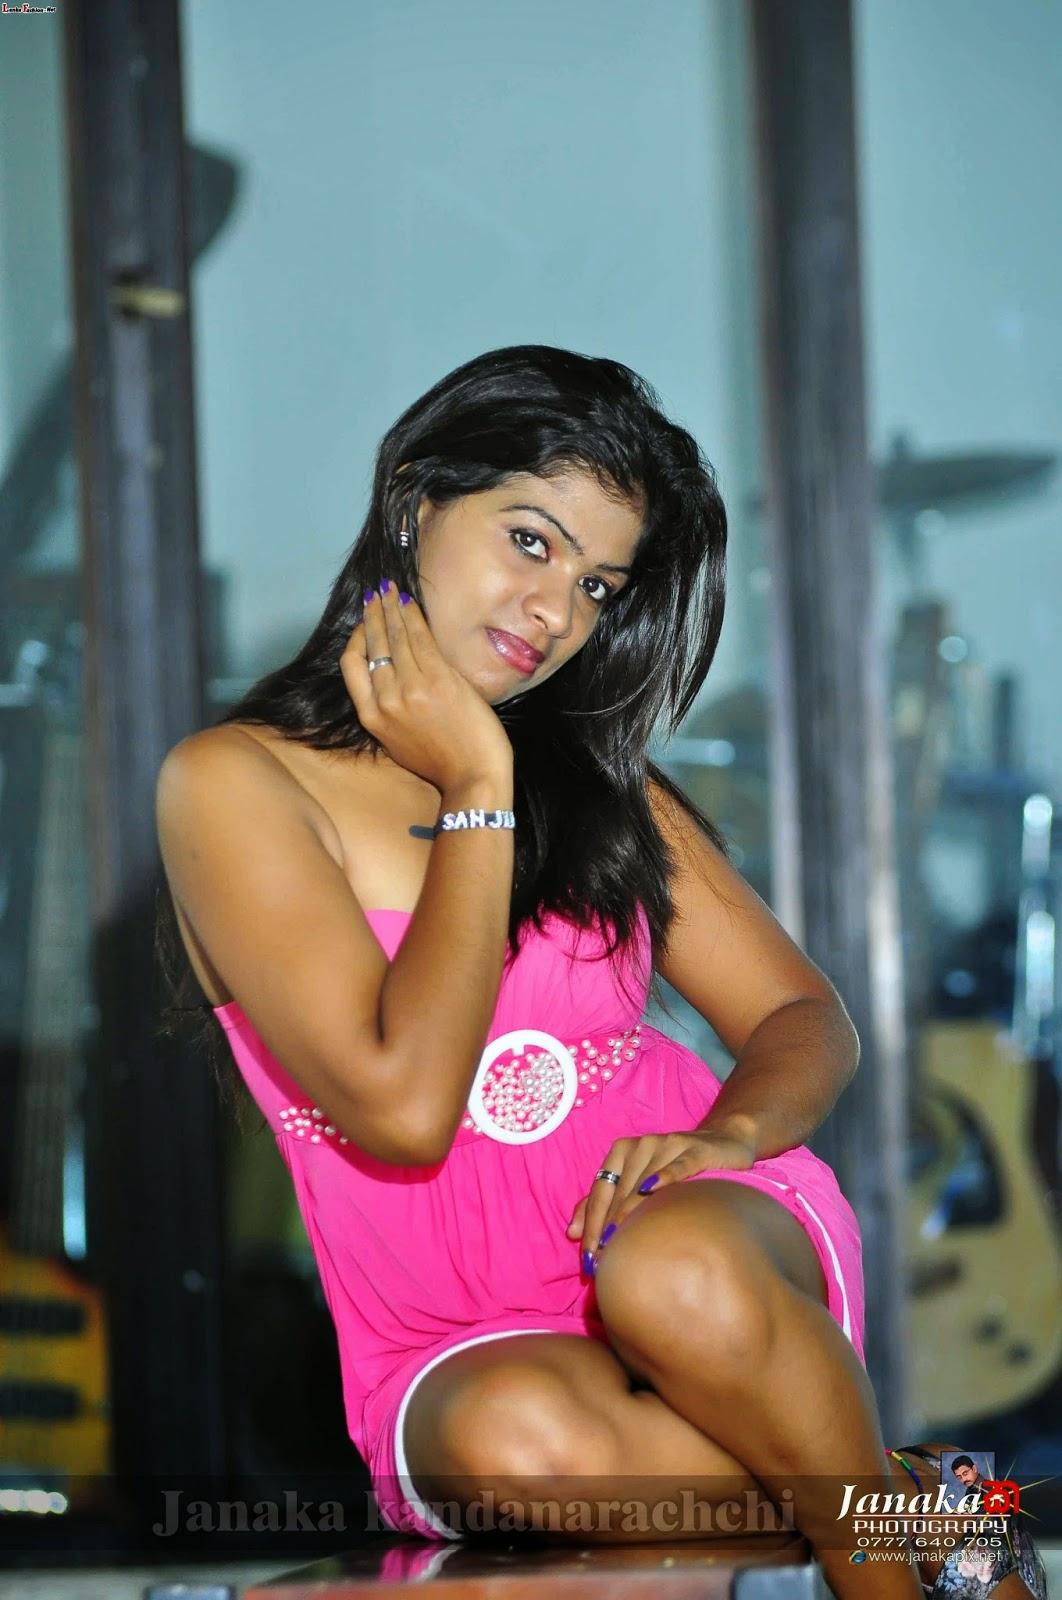 Sanjana Perera leg